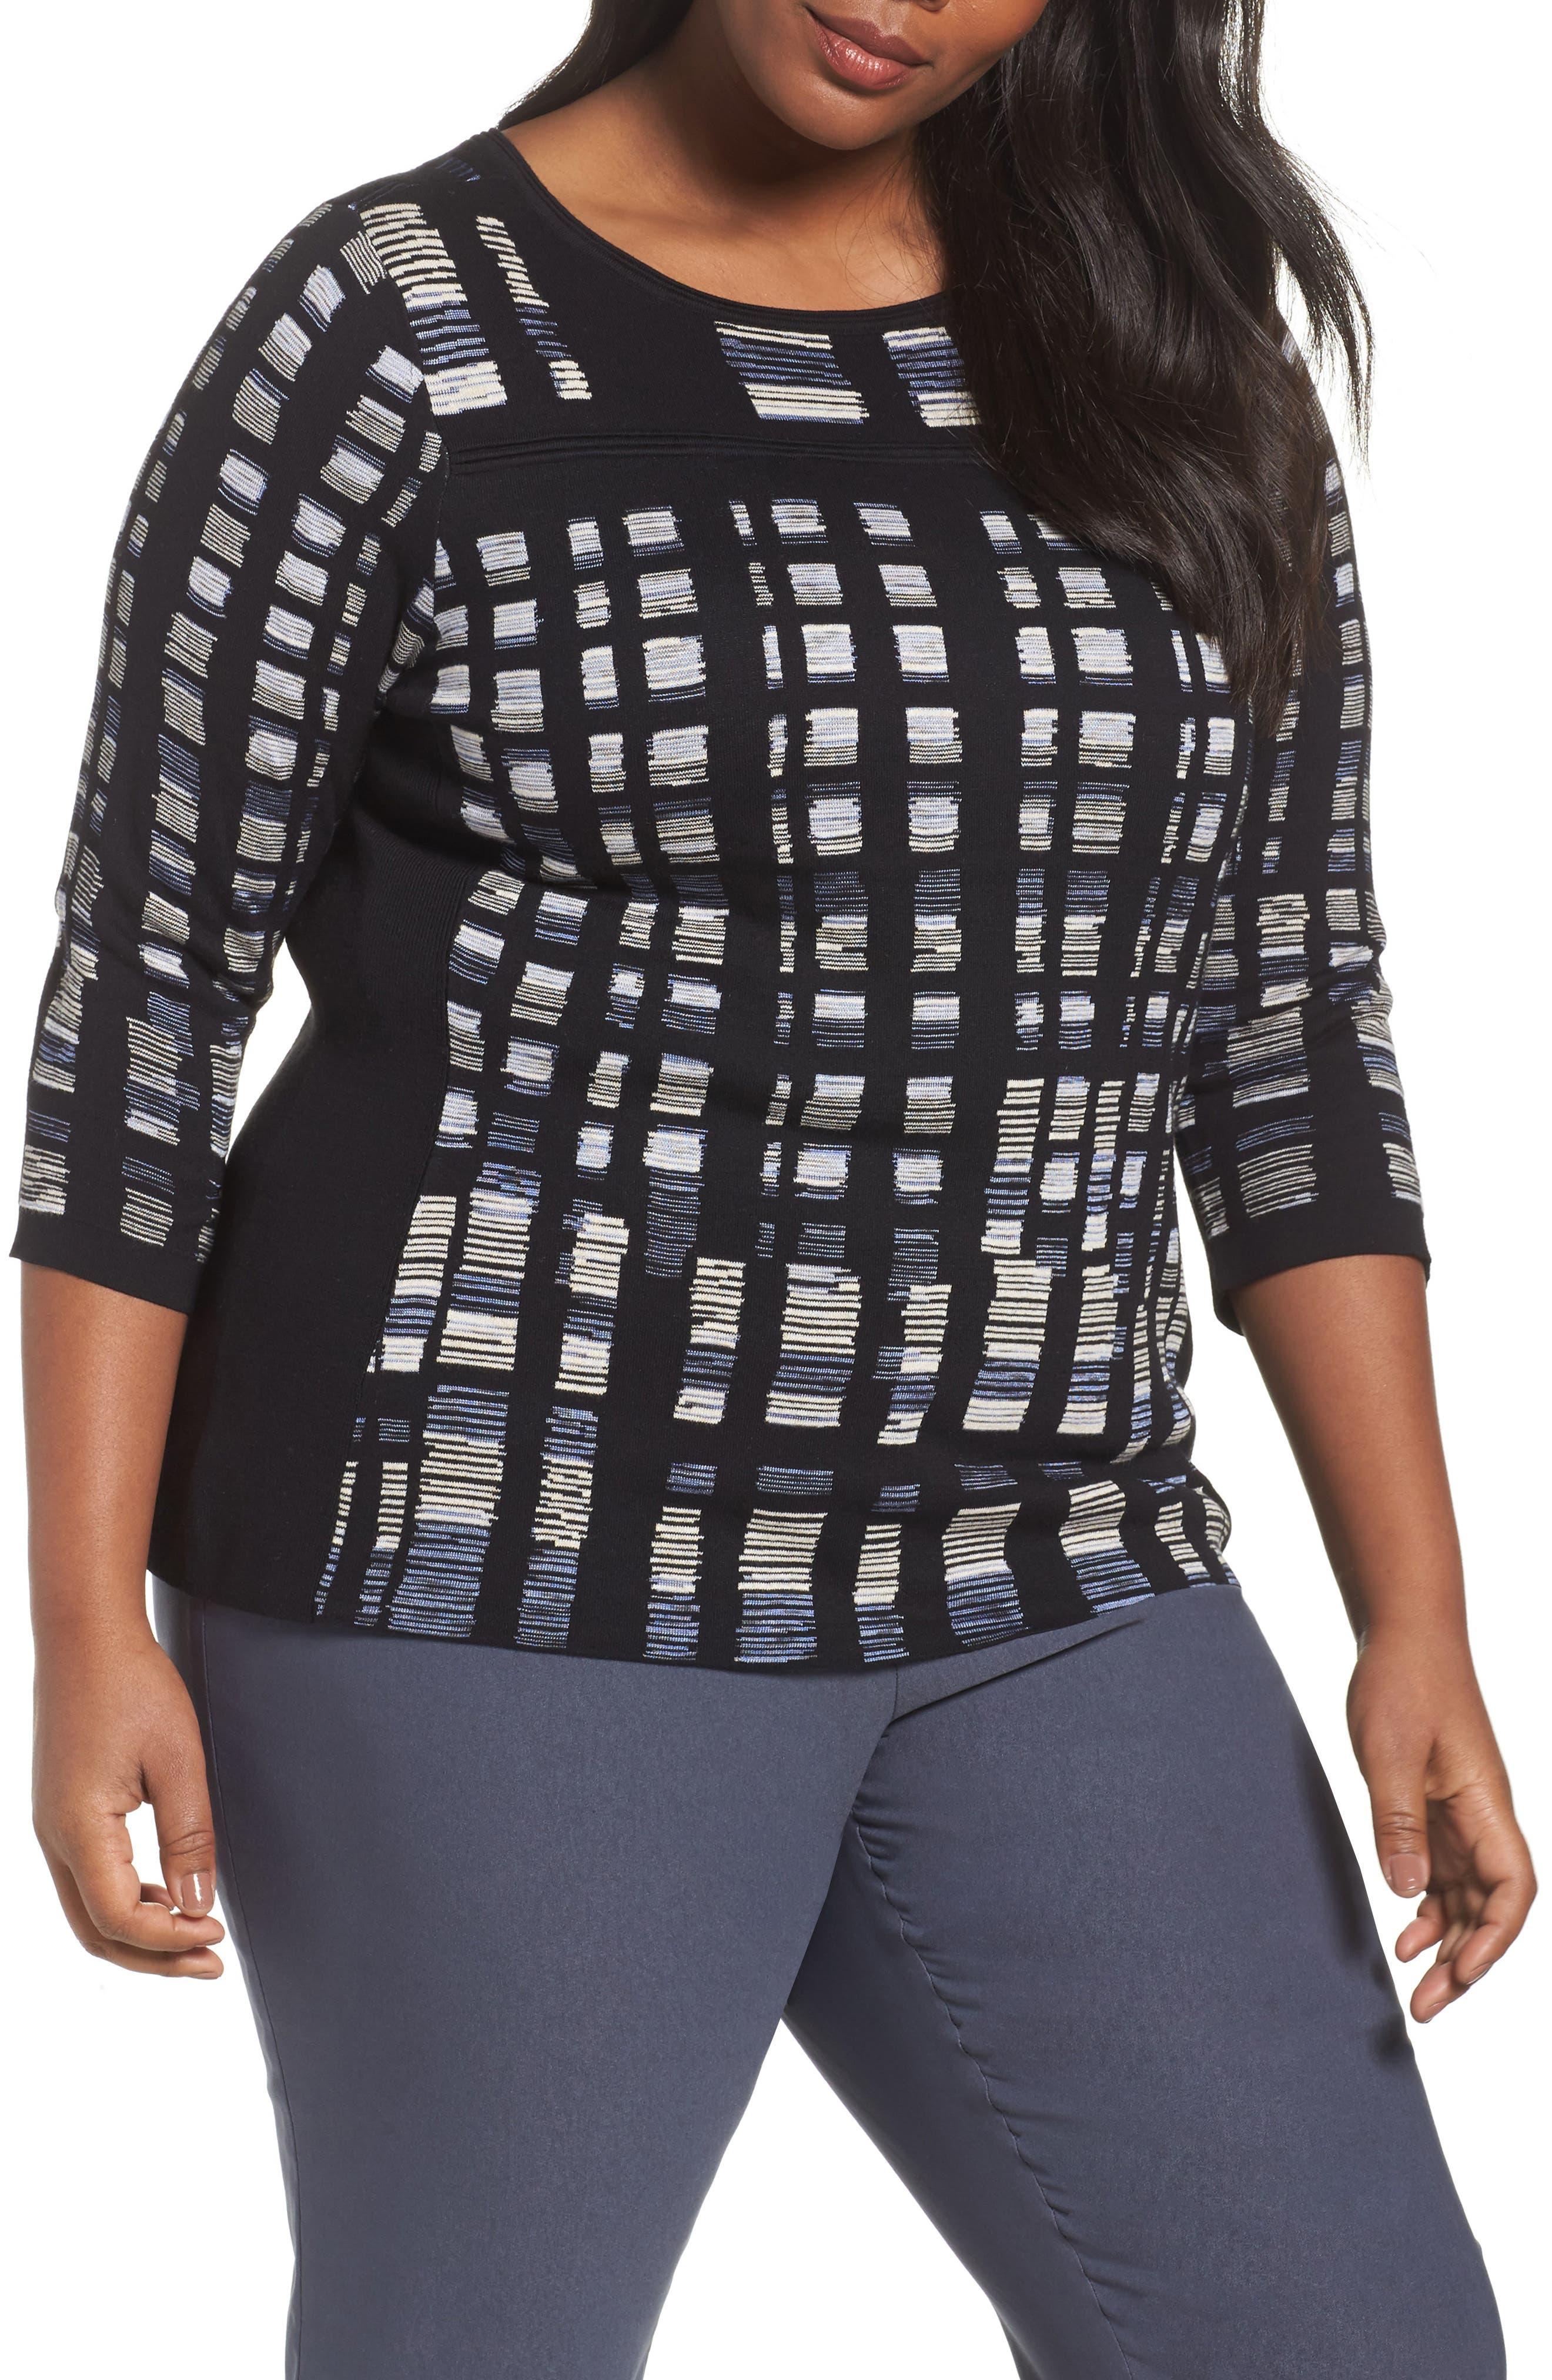 Crystal Cove Sweater,                             Main thumbnail 1, color,                             Black Multi